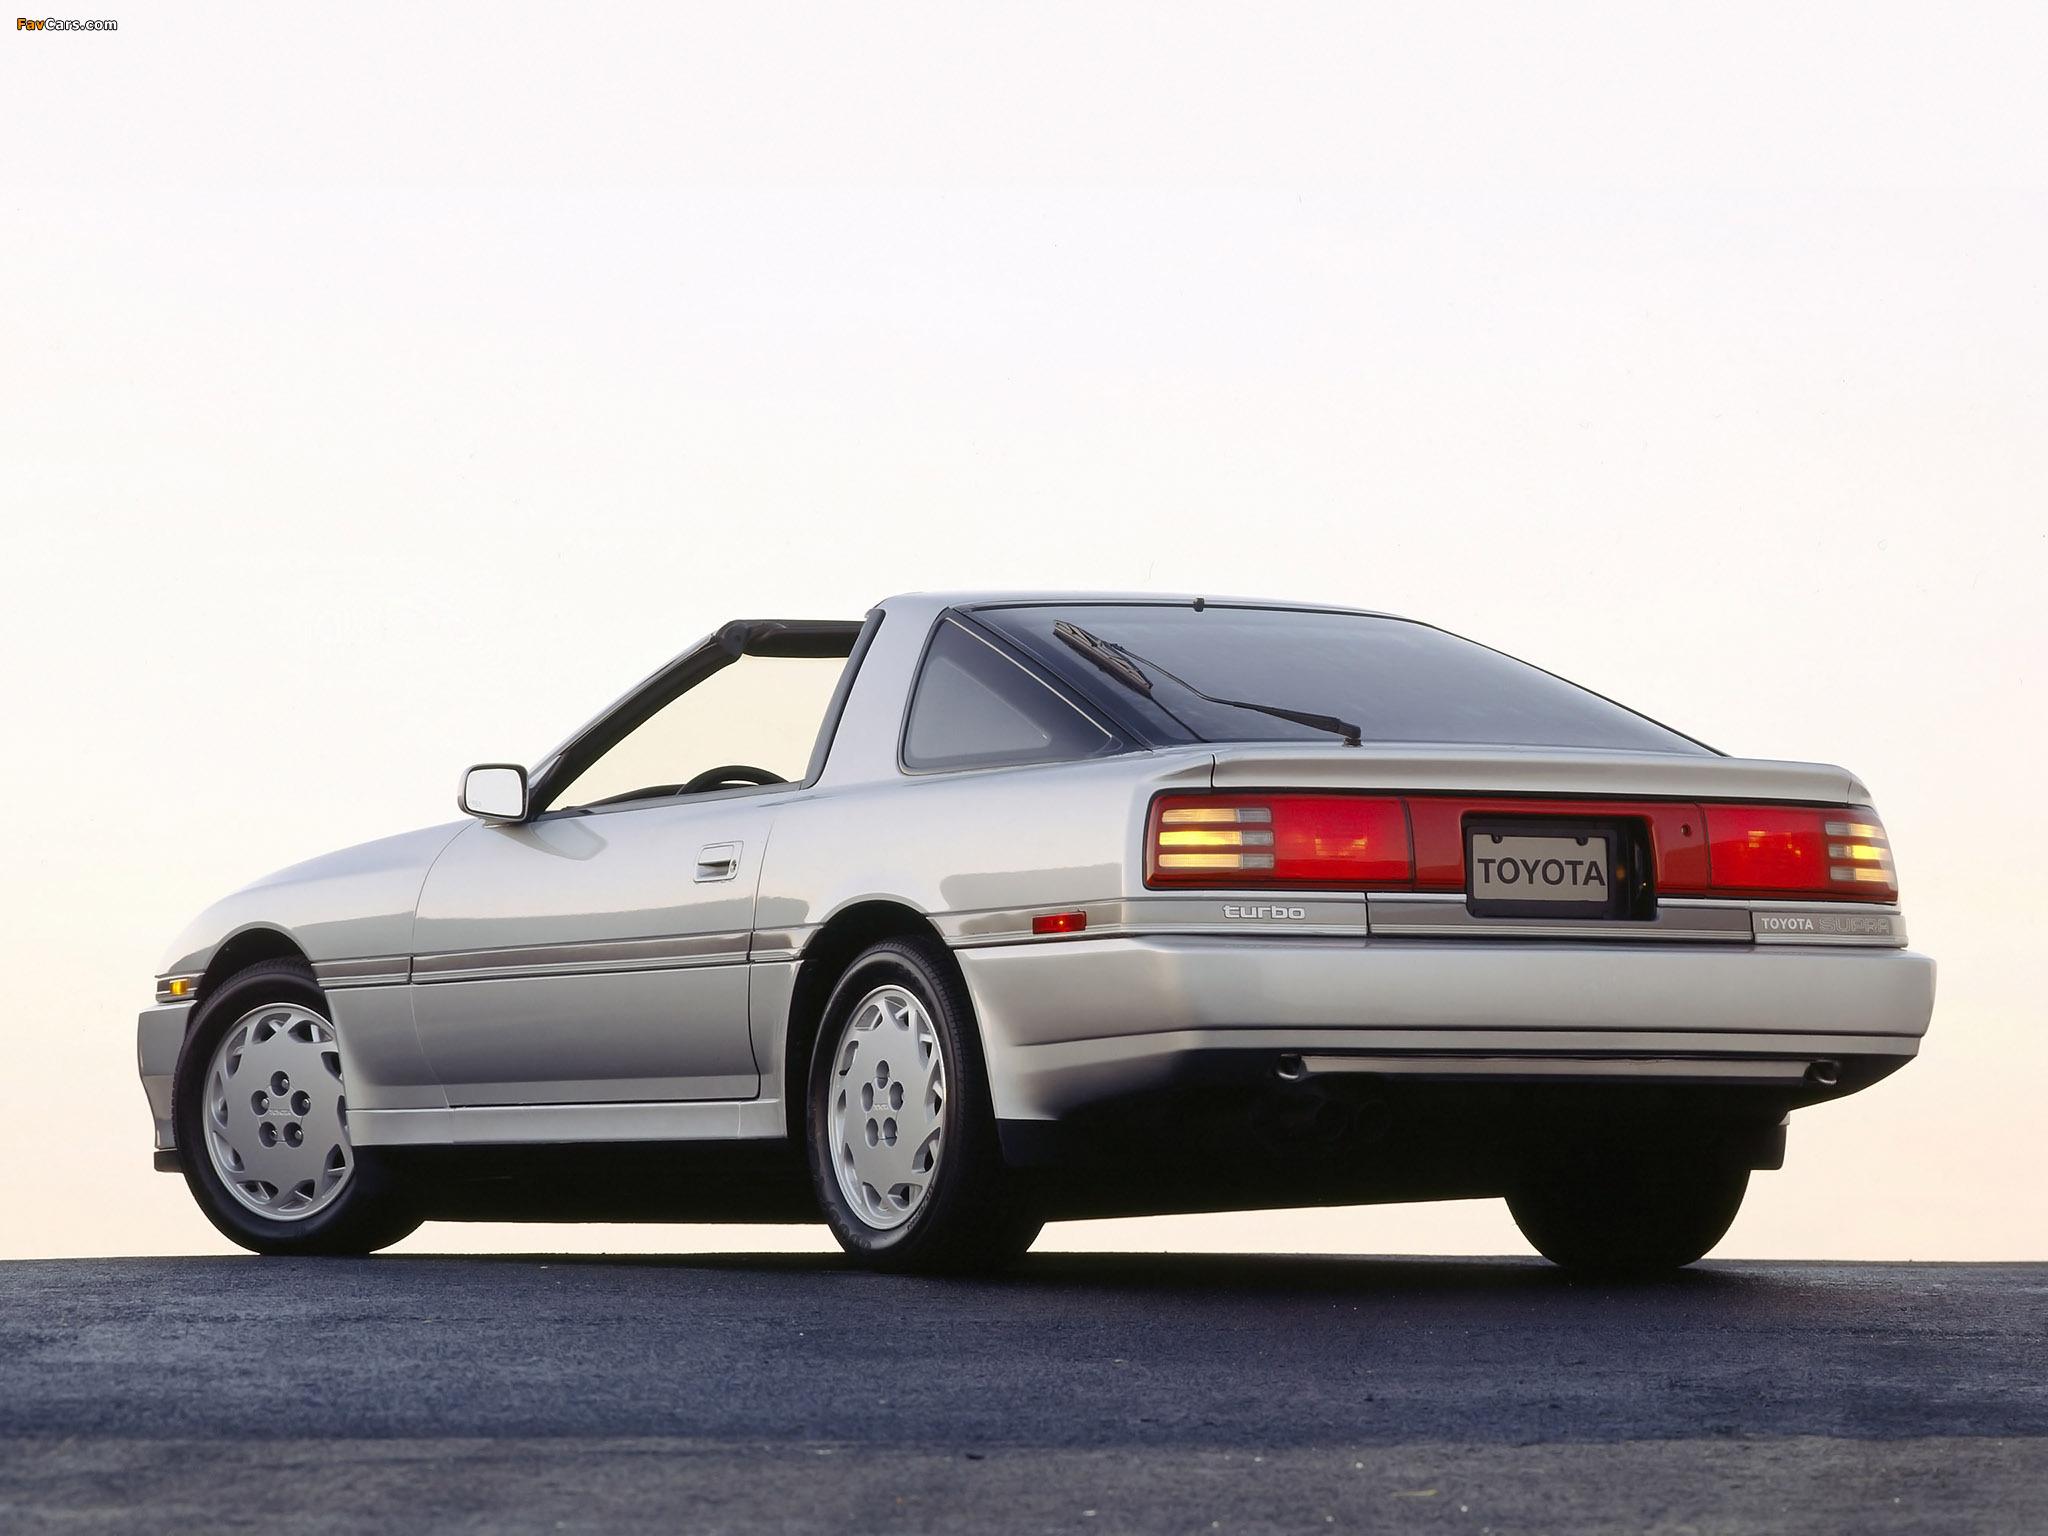 Pictures Of Toyota Supra 3 0 Turbo Sport Roof Us Spec